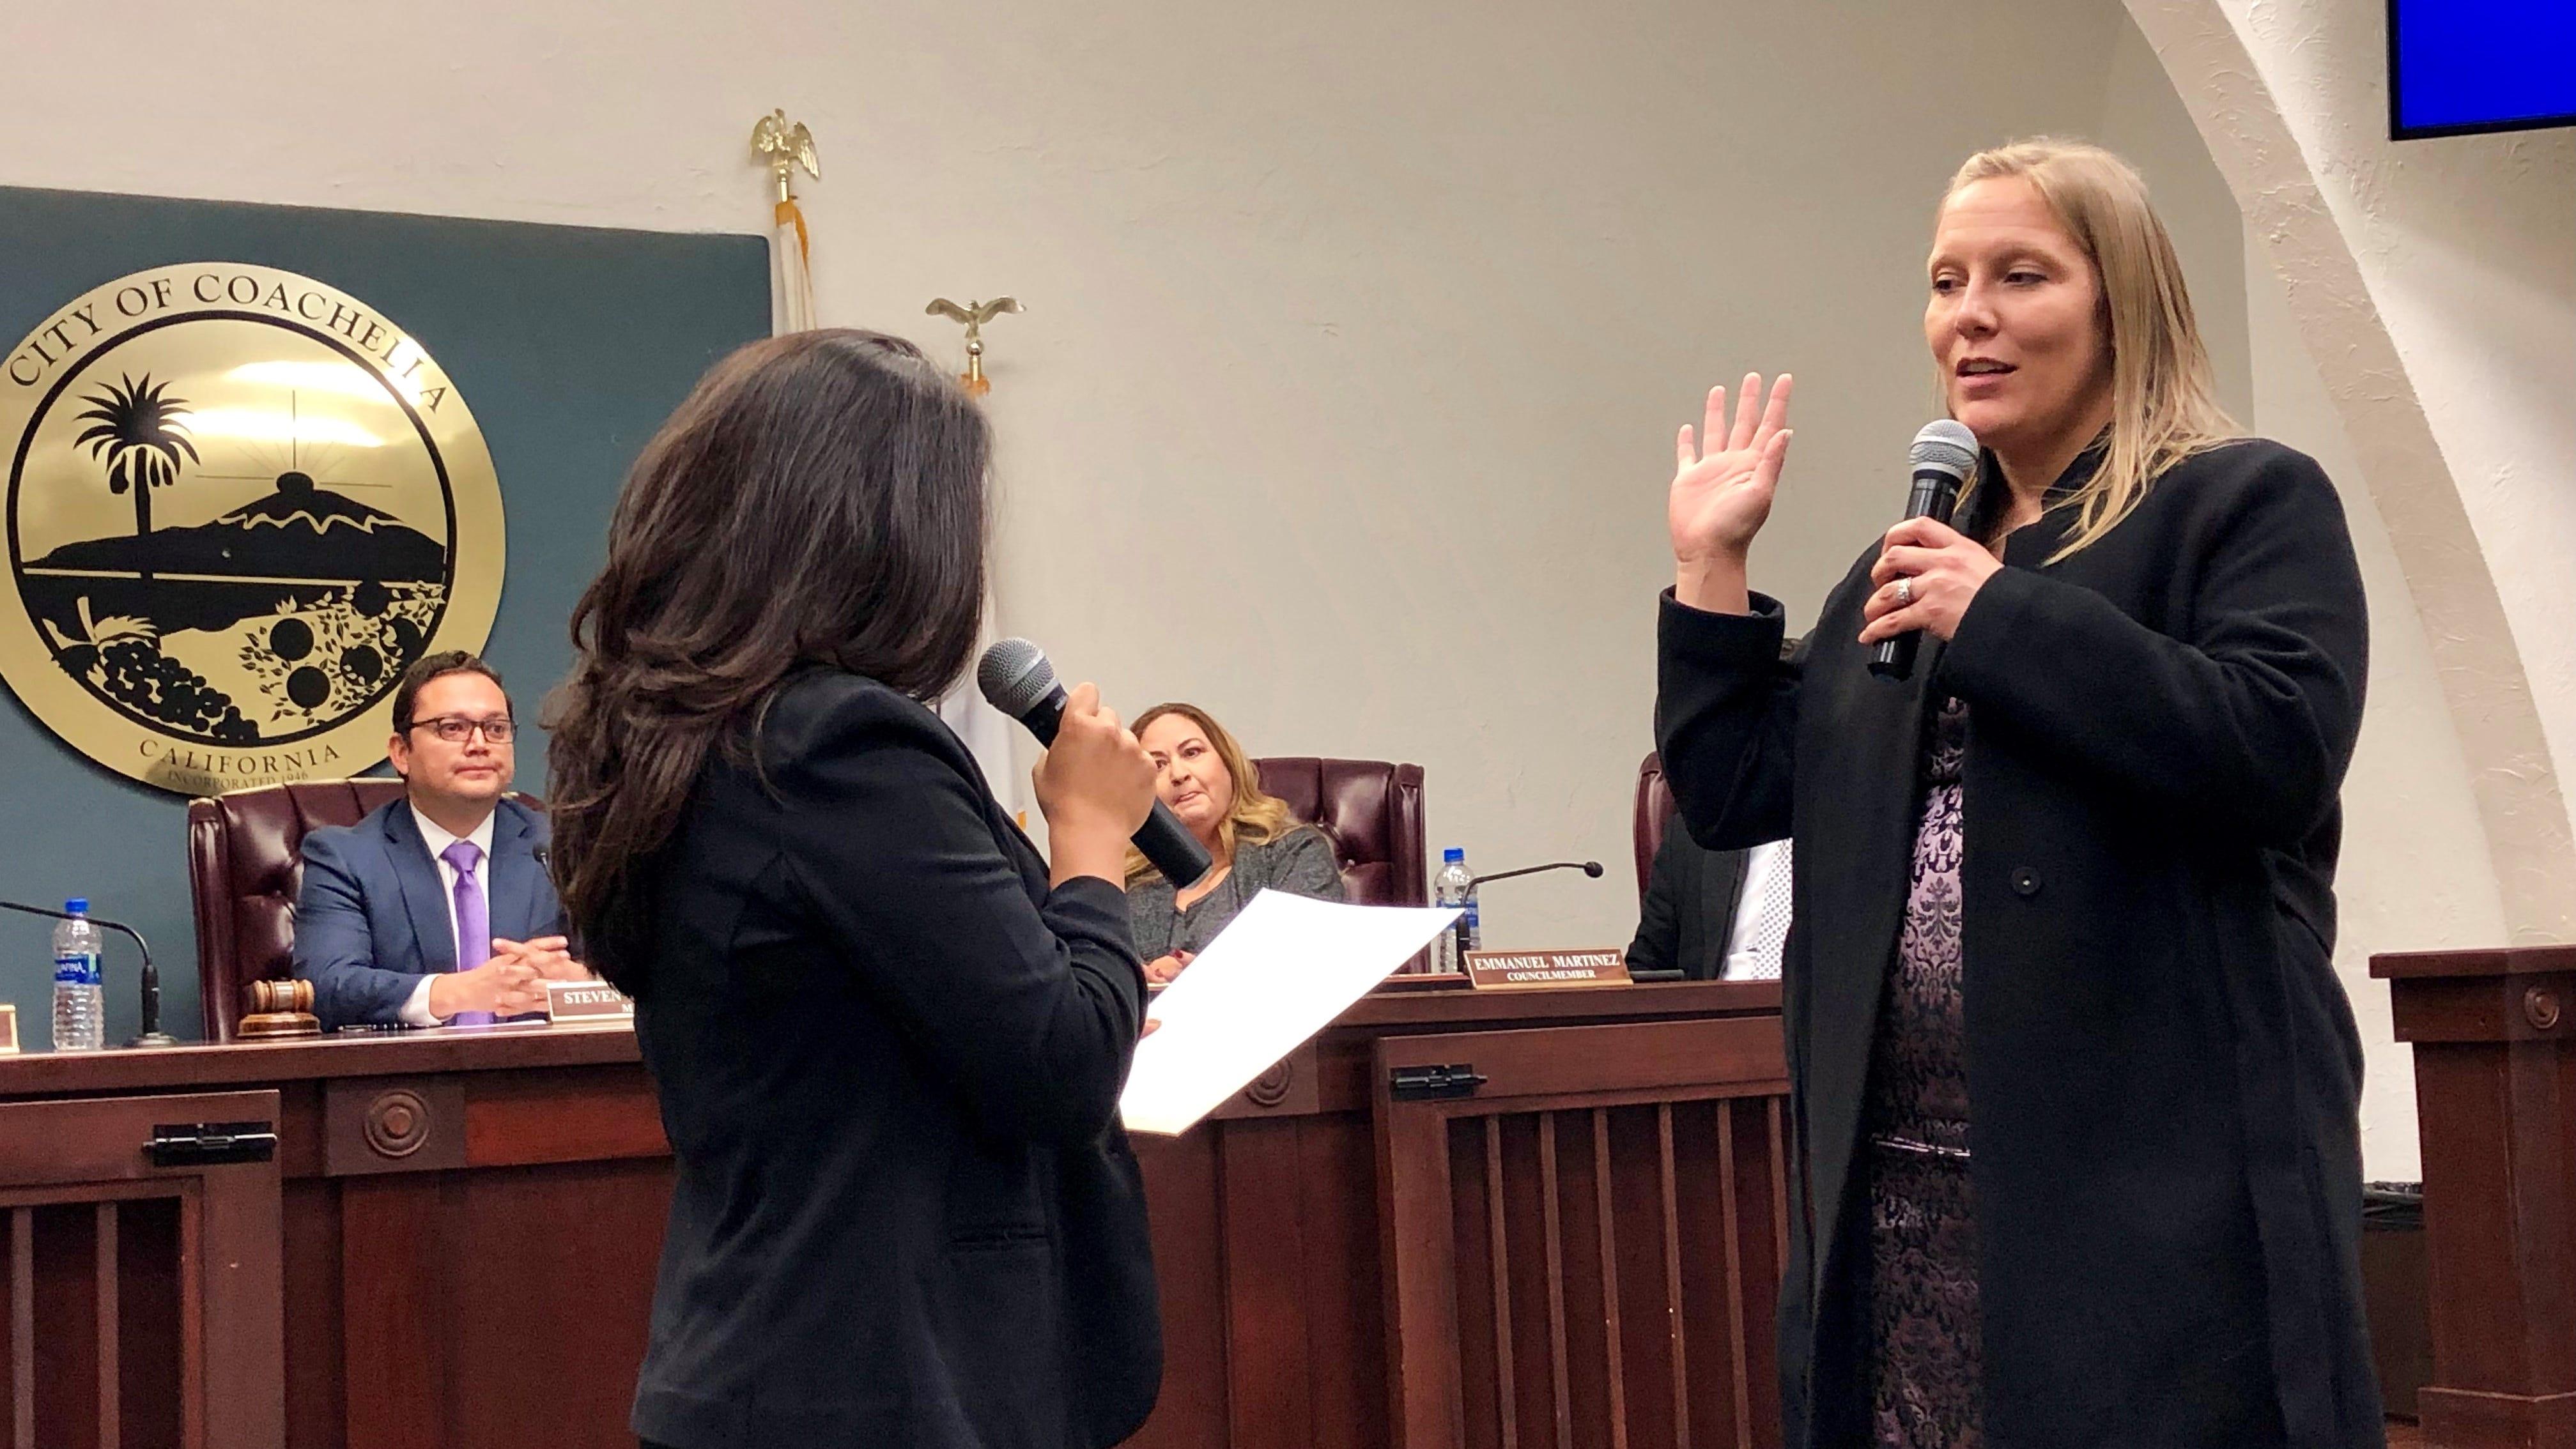 Incoming Coachella City Council members Beaman-Jacinto, Gonzalez sworn in